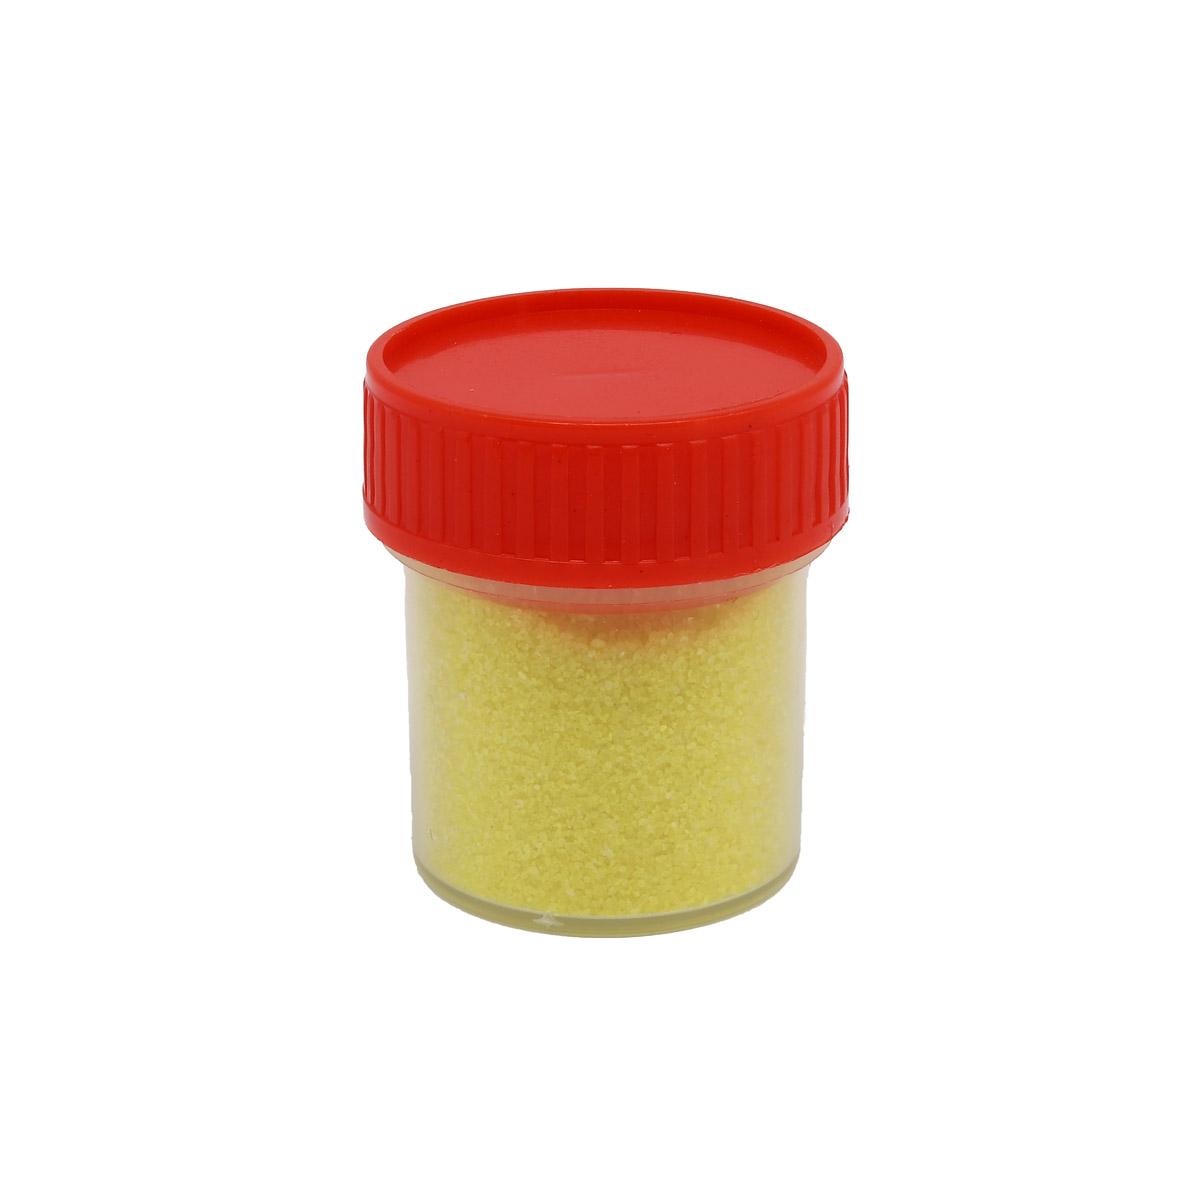 АК-0003-1 Пыльца гранулир. 0,1мм в баночке 20мл желтая